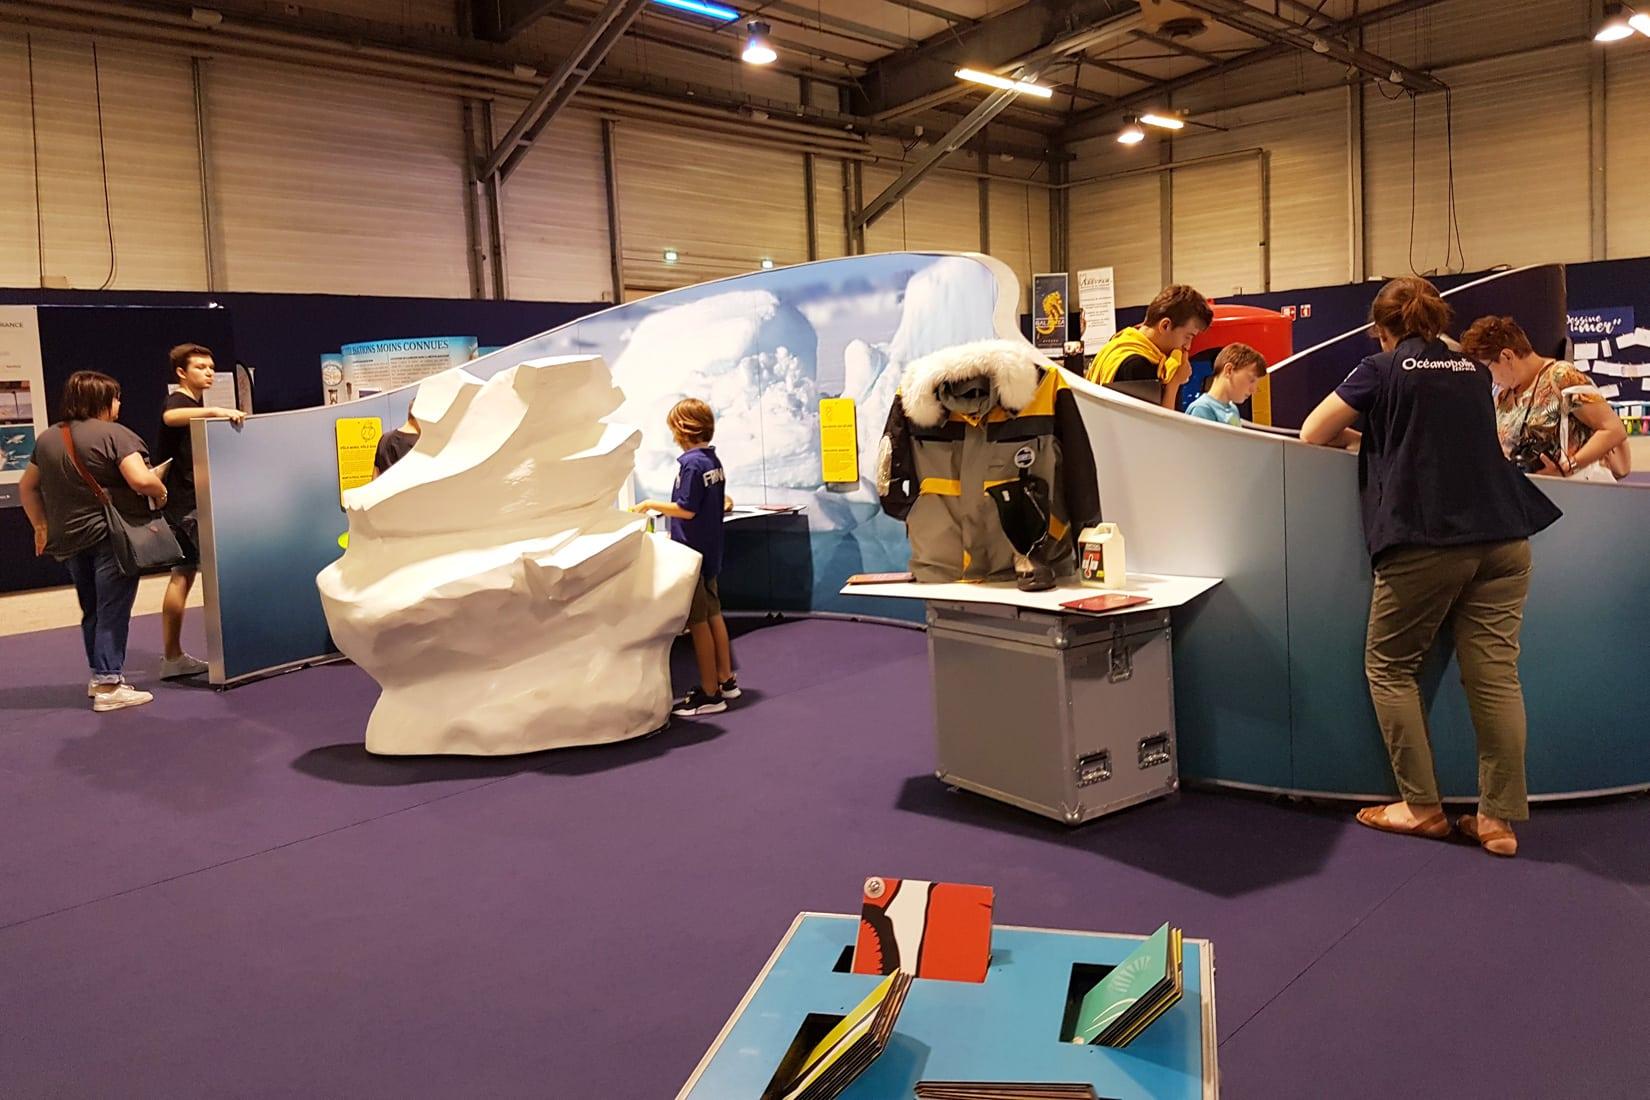 Exposition Cyclops Océanopolis à la Mer XXL à Nantes © Océanopolis